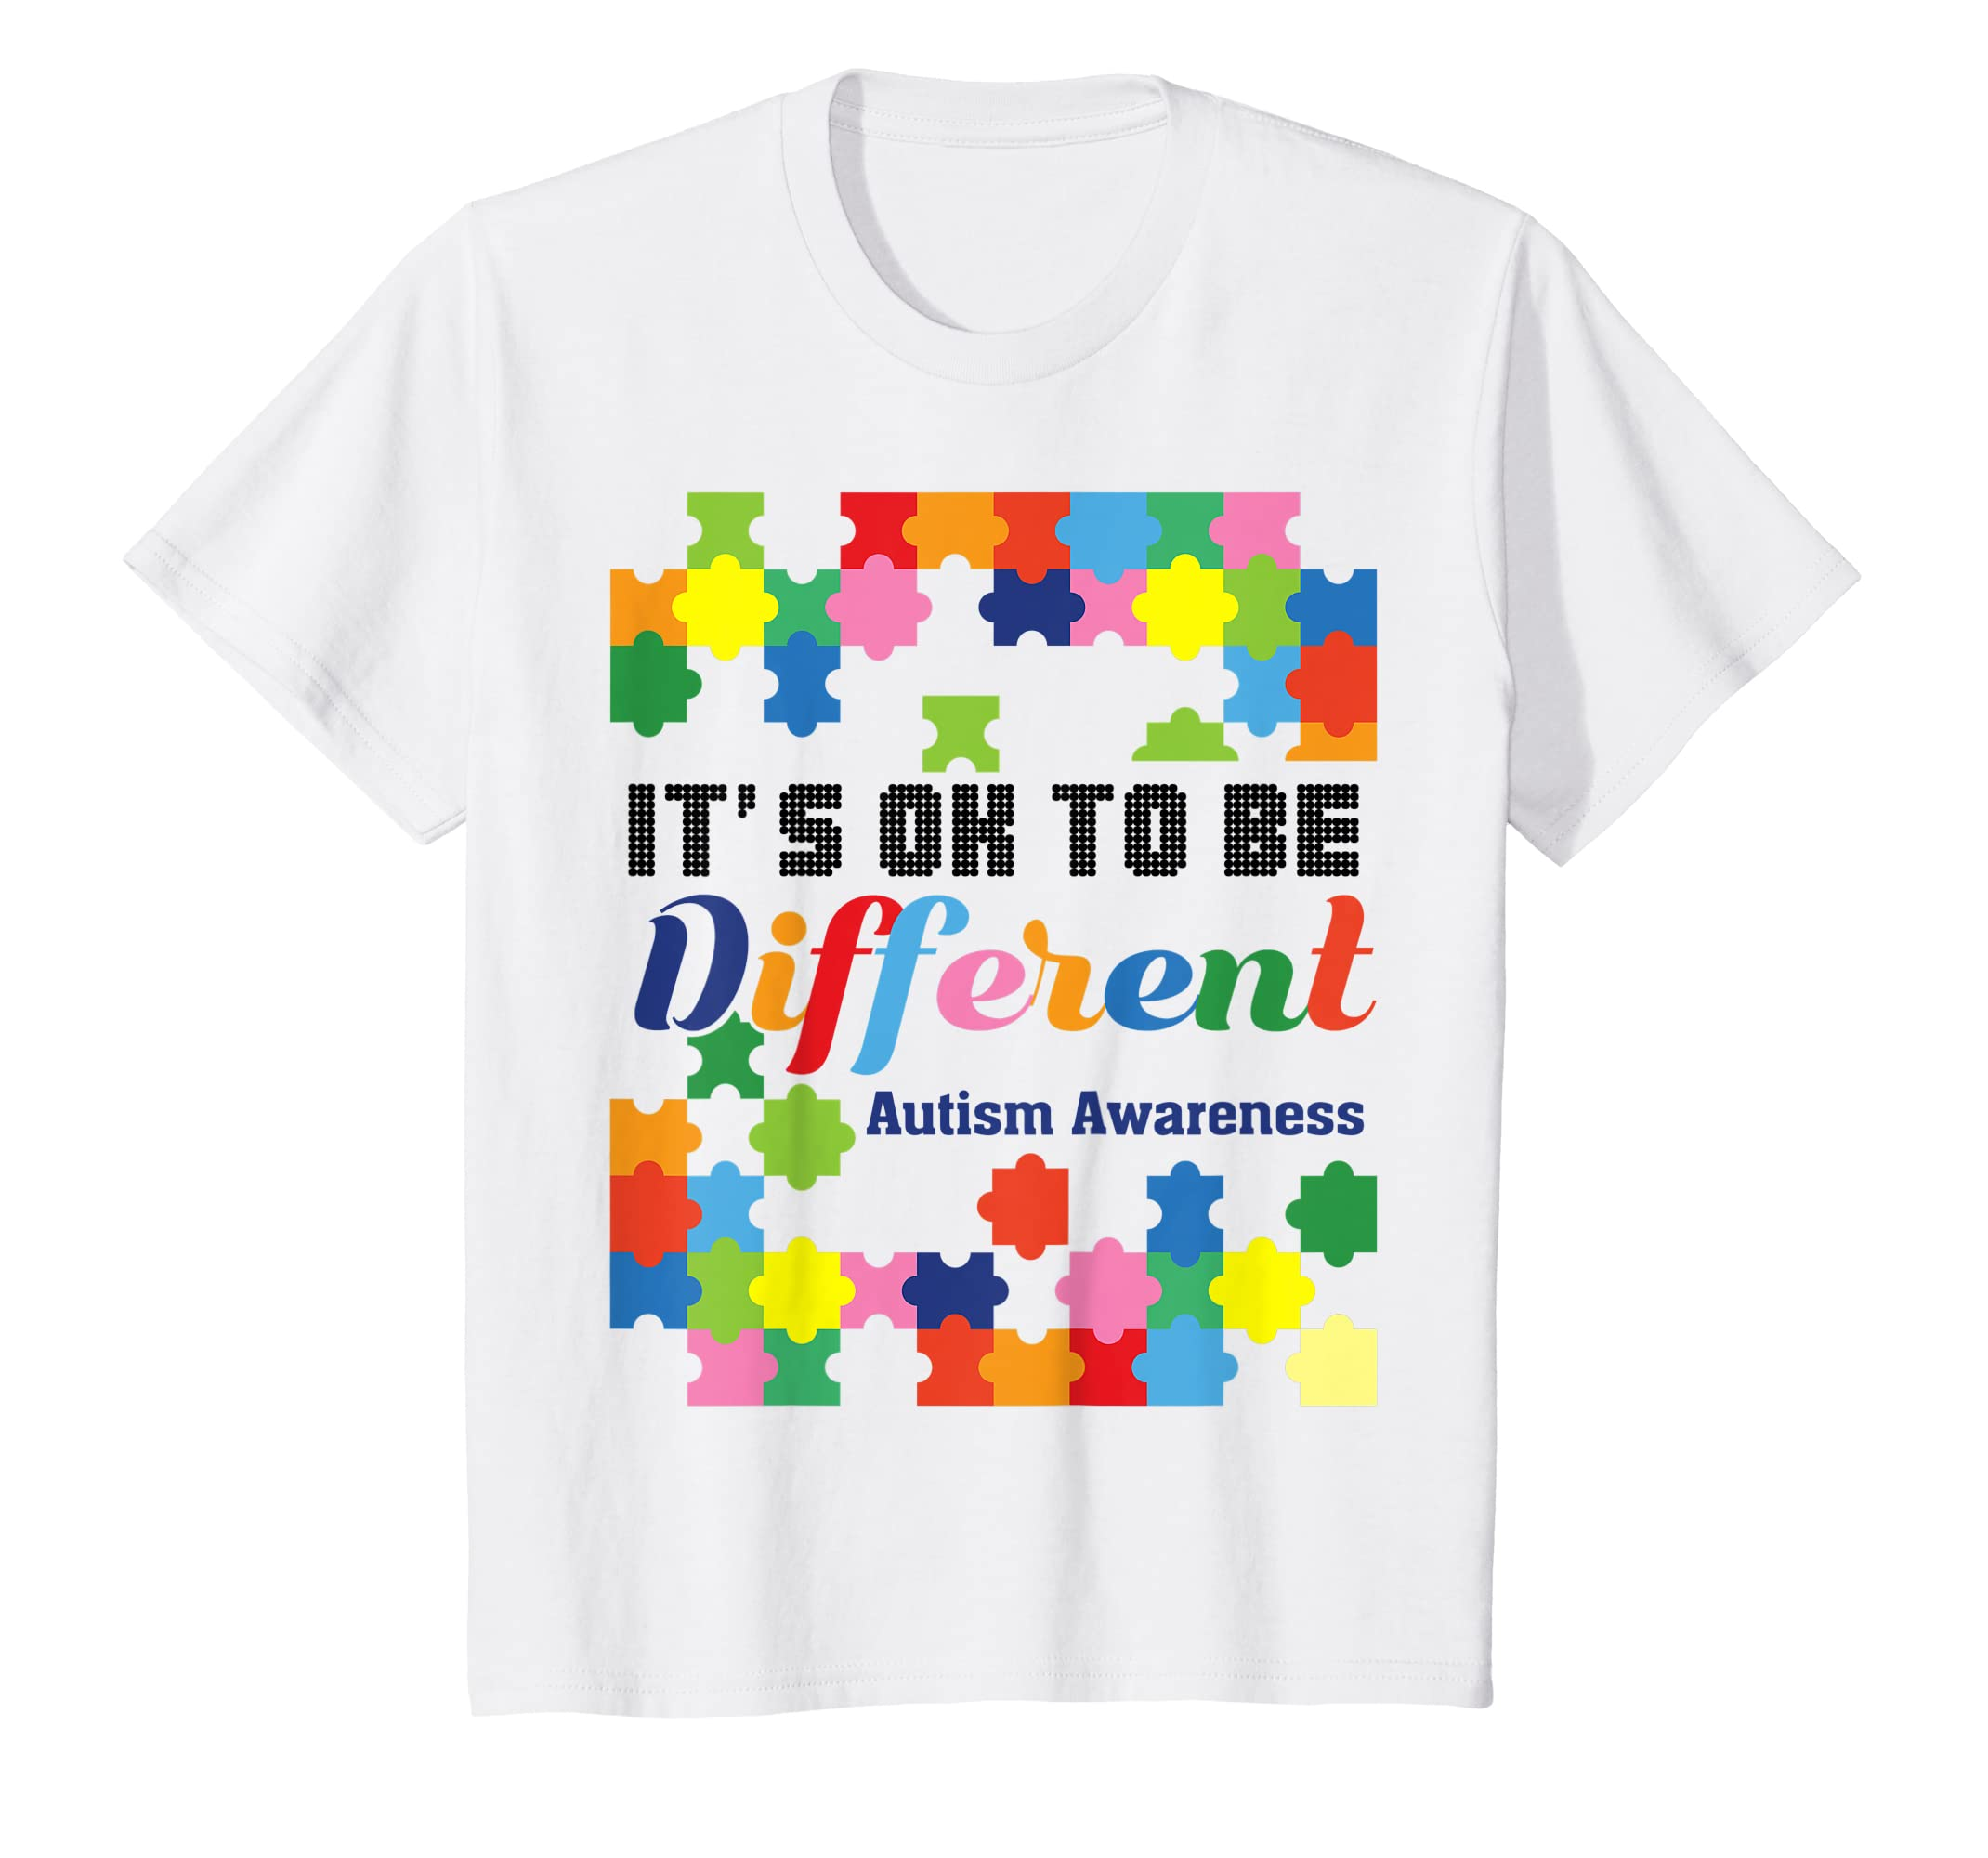 2e91bdf676f Amazon.com  Cute Cool Funny Autism Gift T Shirts for Men Boys Girls Kids   Clothing